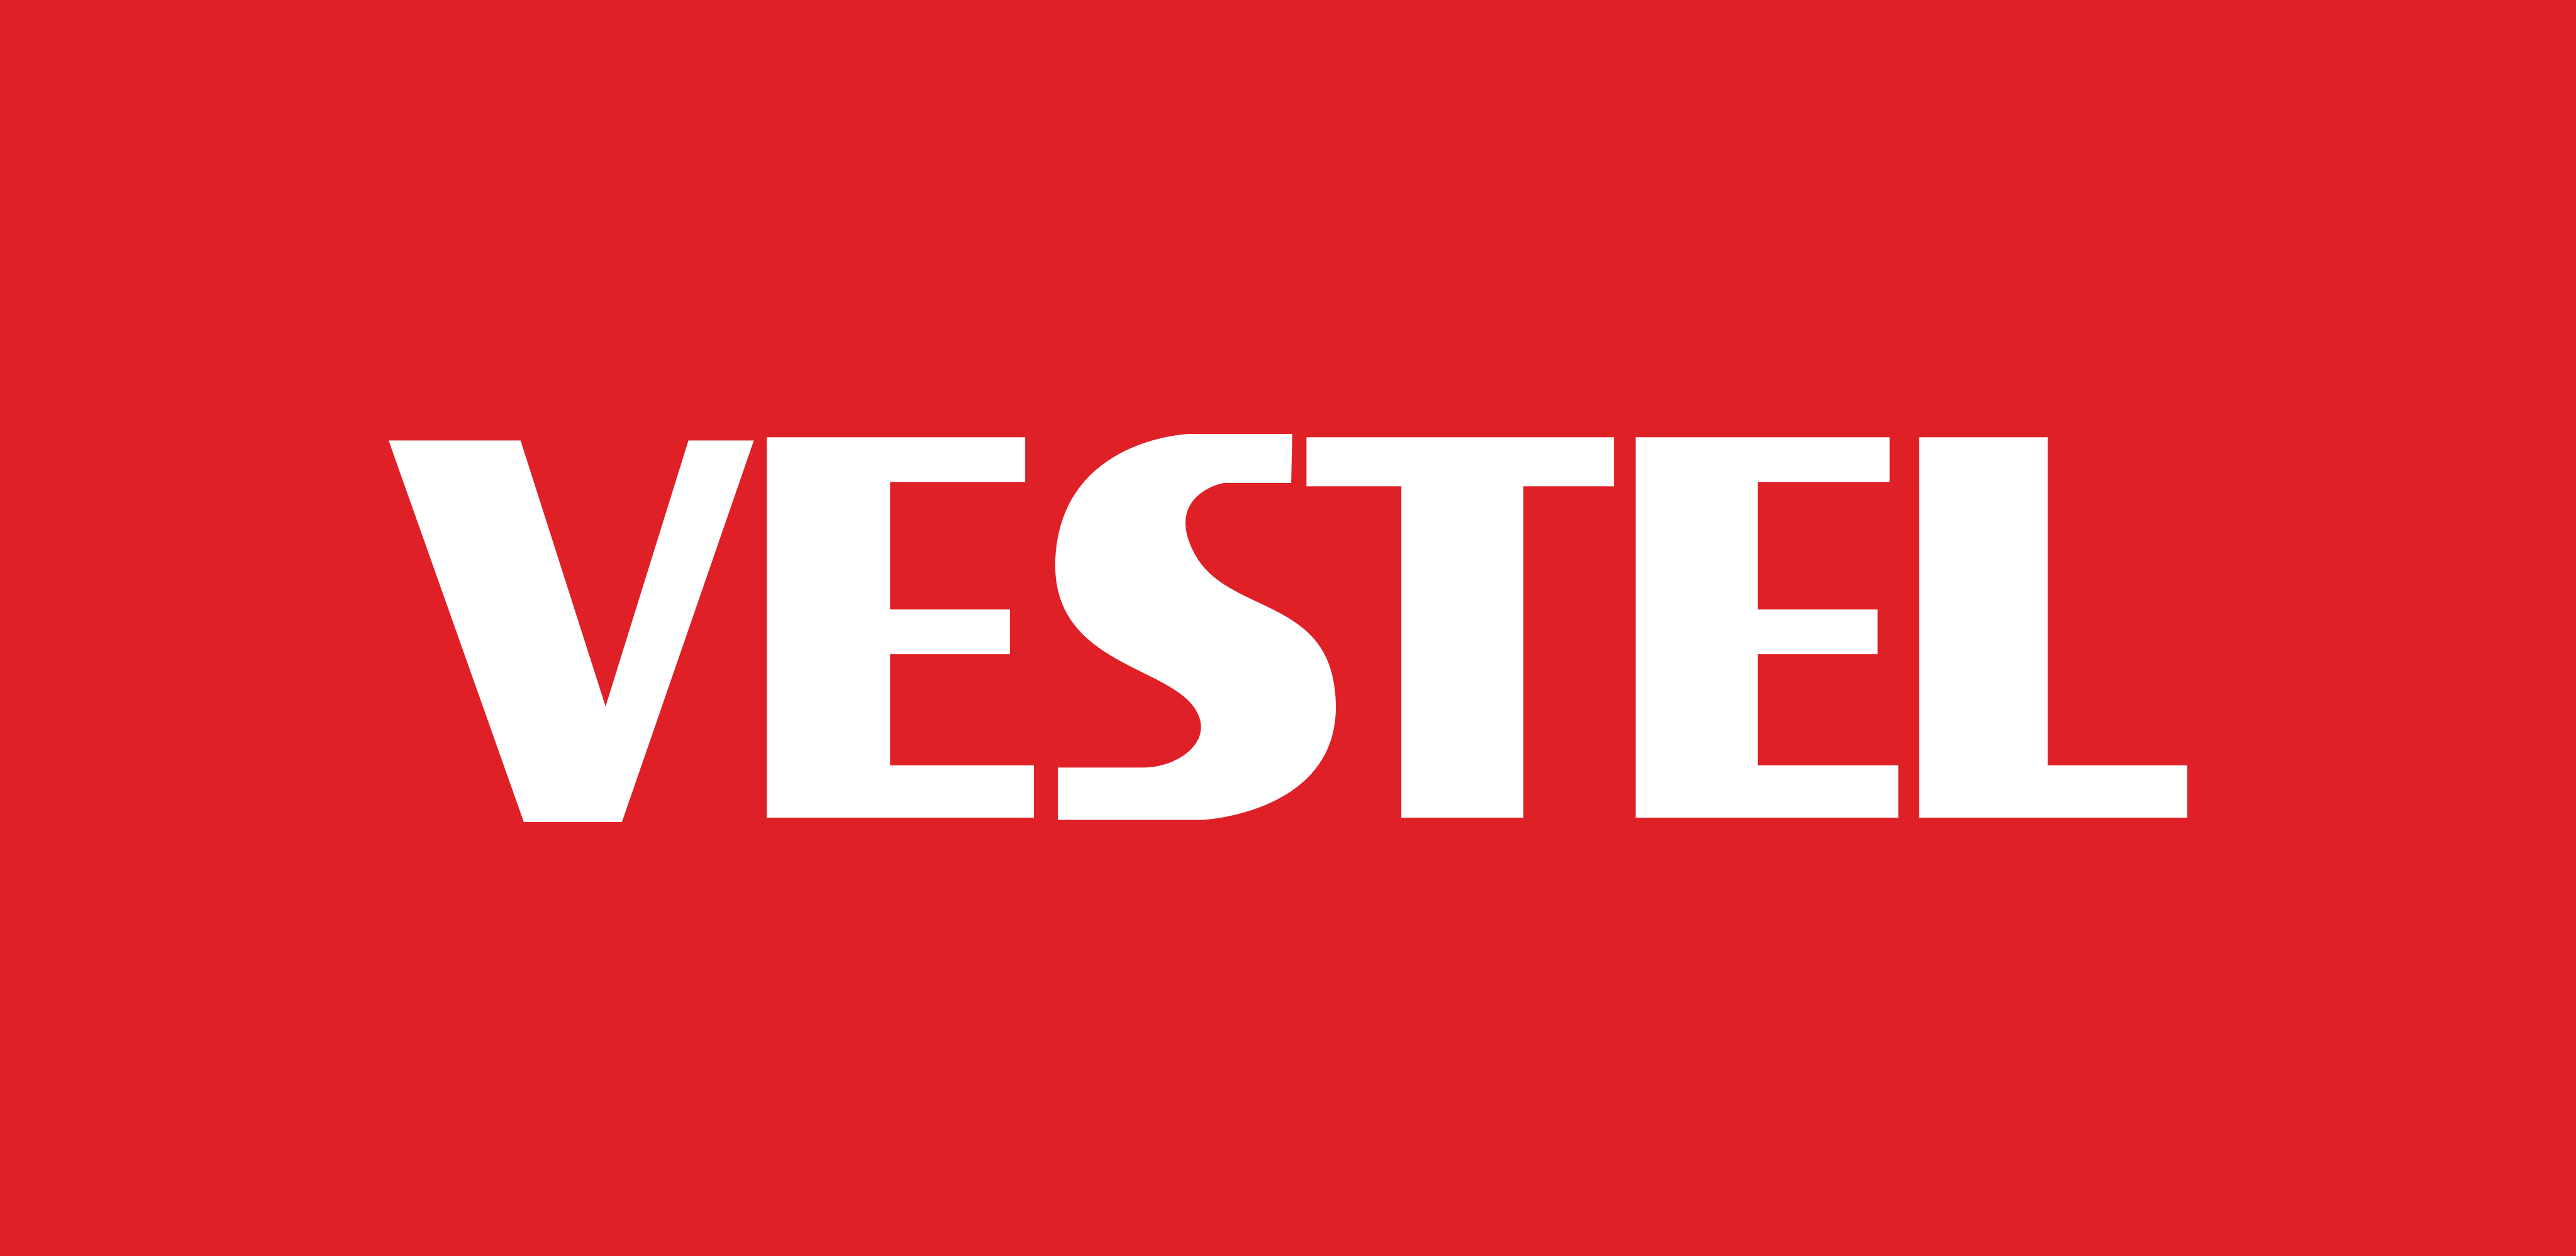 Vestel Design Thinking Eğitimi